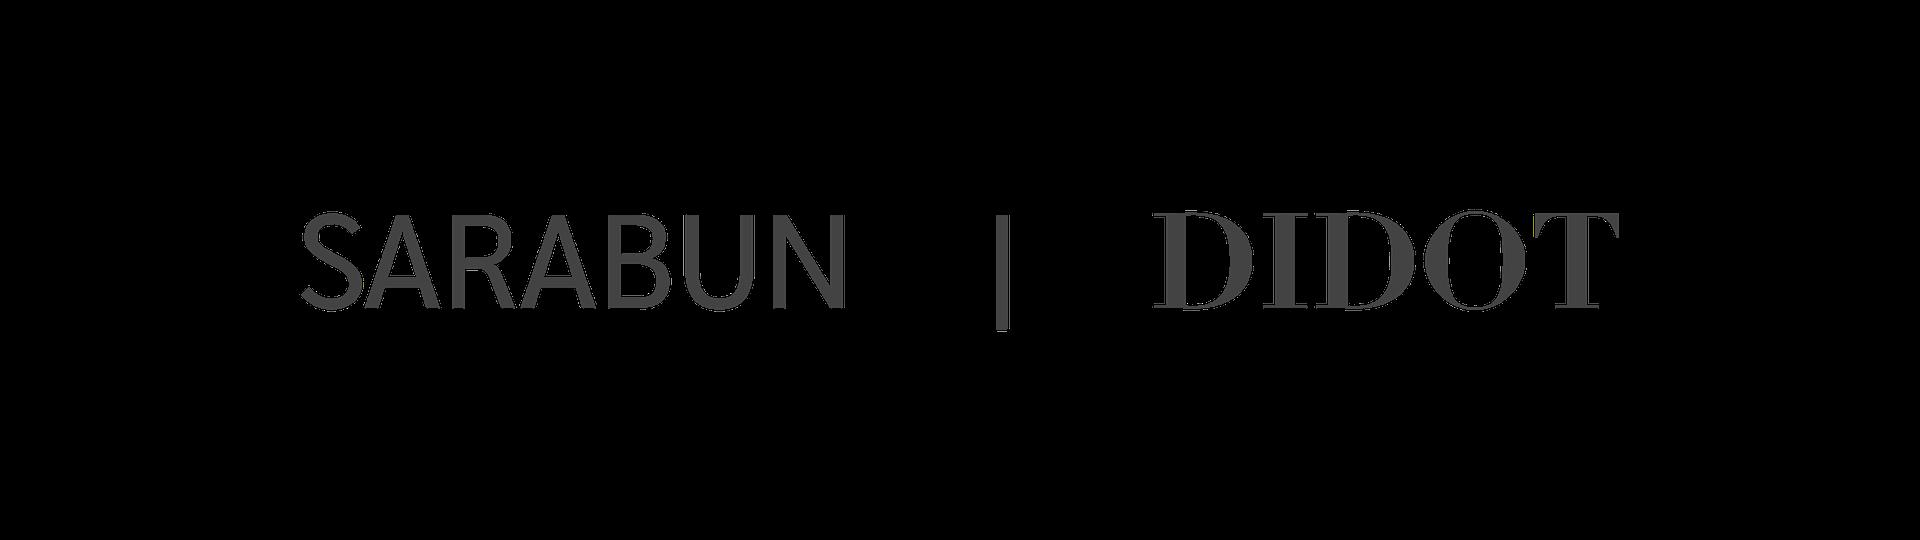 Type specimen, Sarabun and Didot fonts